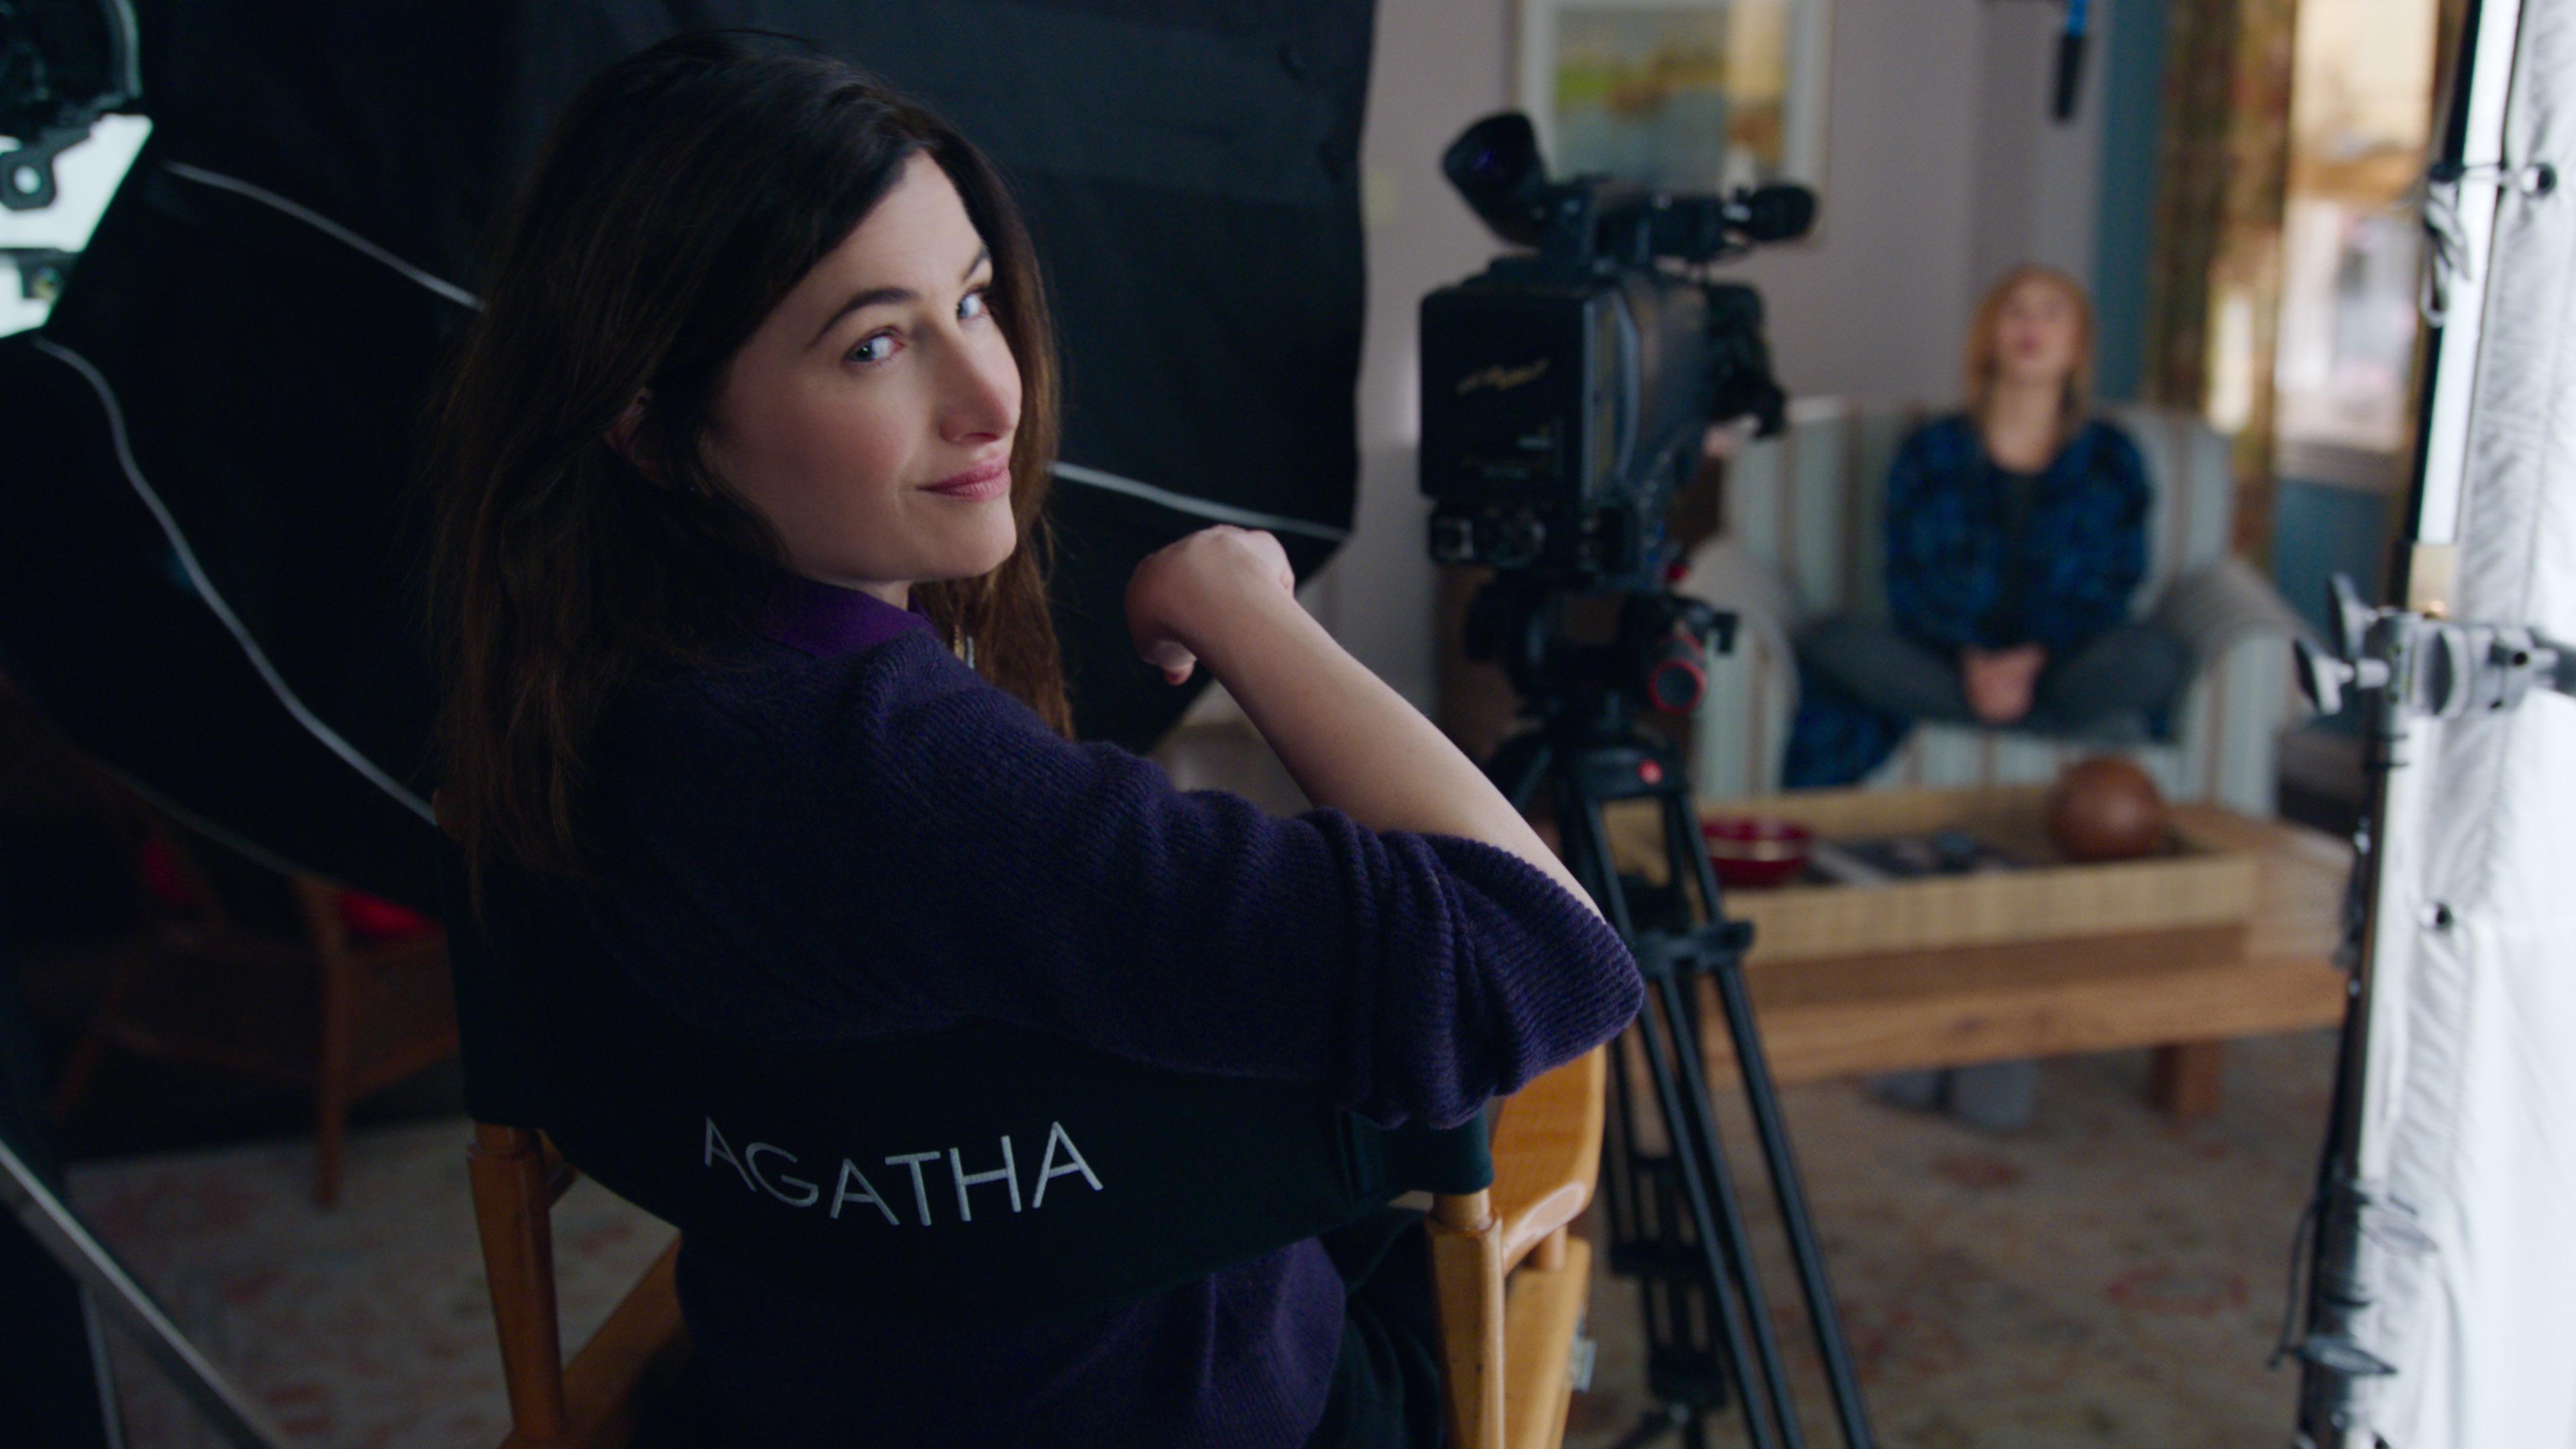 Kathryn Hahn as Agatha Harkness in WandaVision